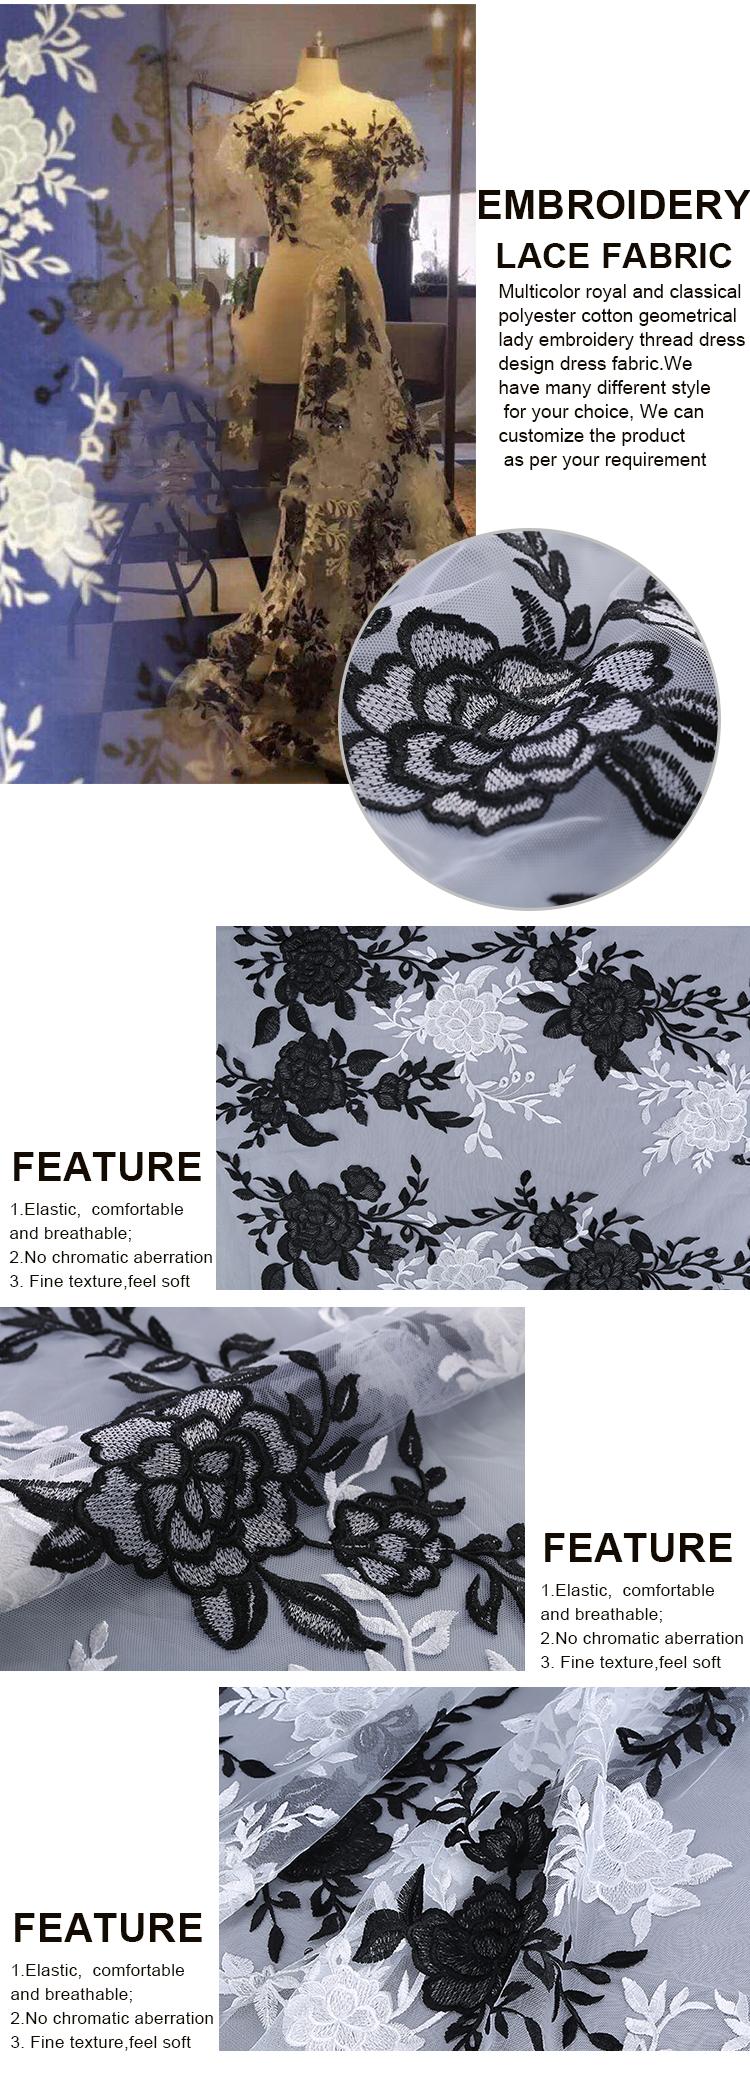 Renda Putih Hitam Grosir Kain Bordir Kustom Mewah Renda untuk Gaun Fashion